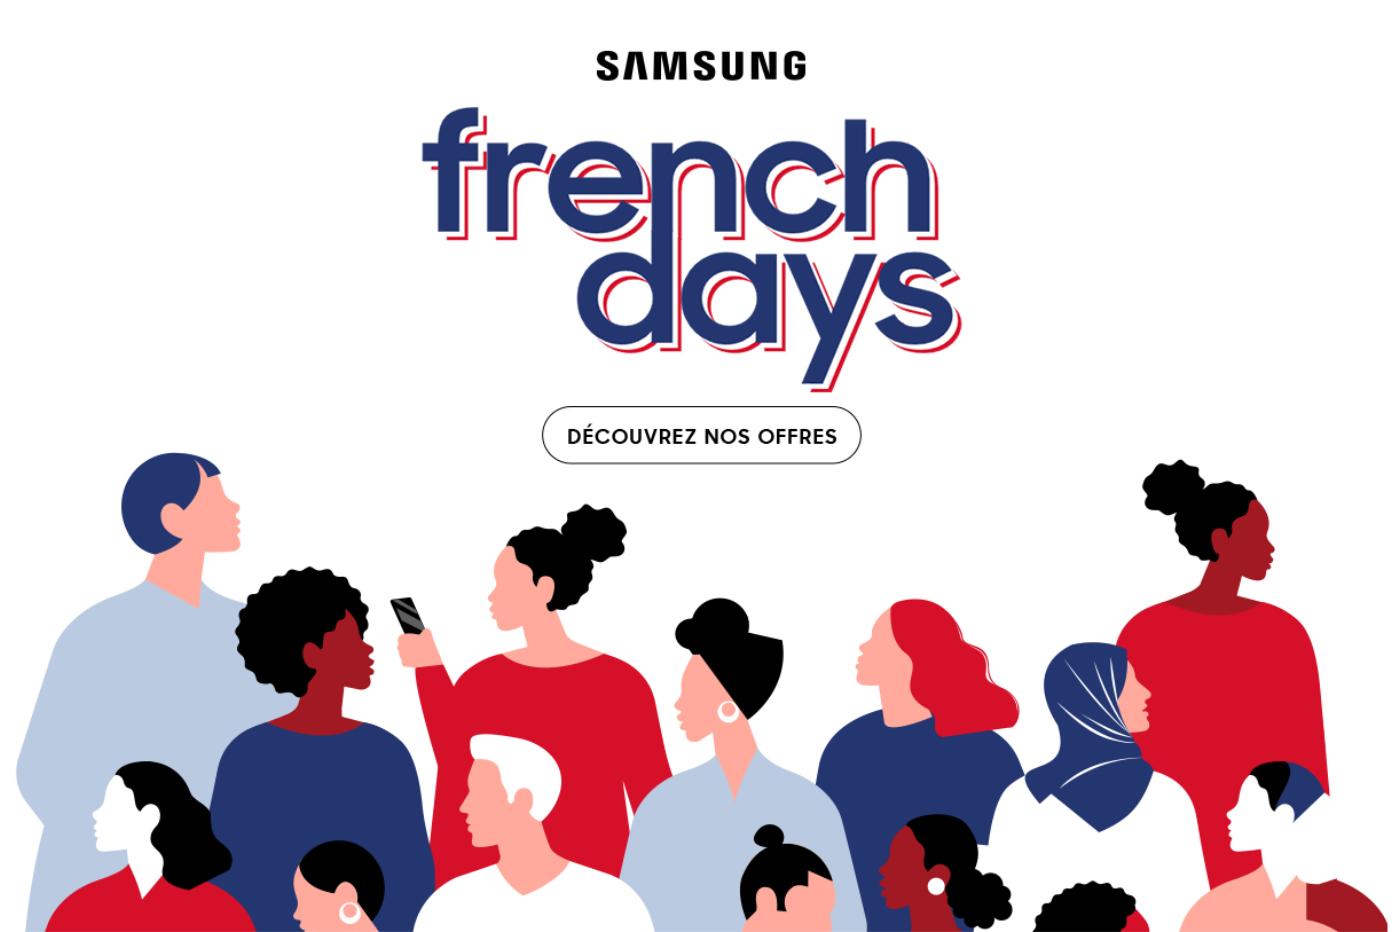 French Days Samsung